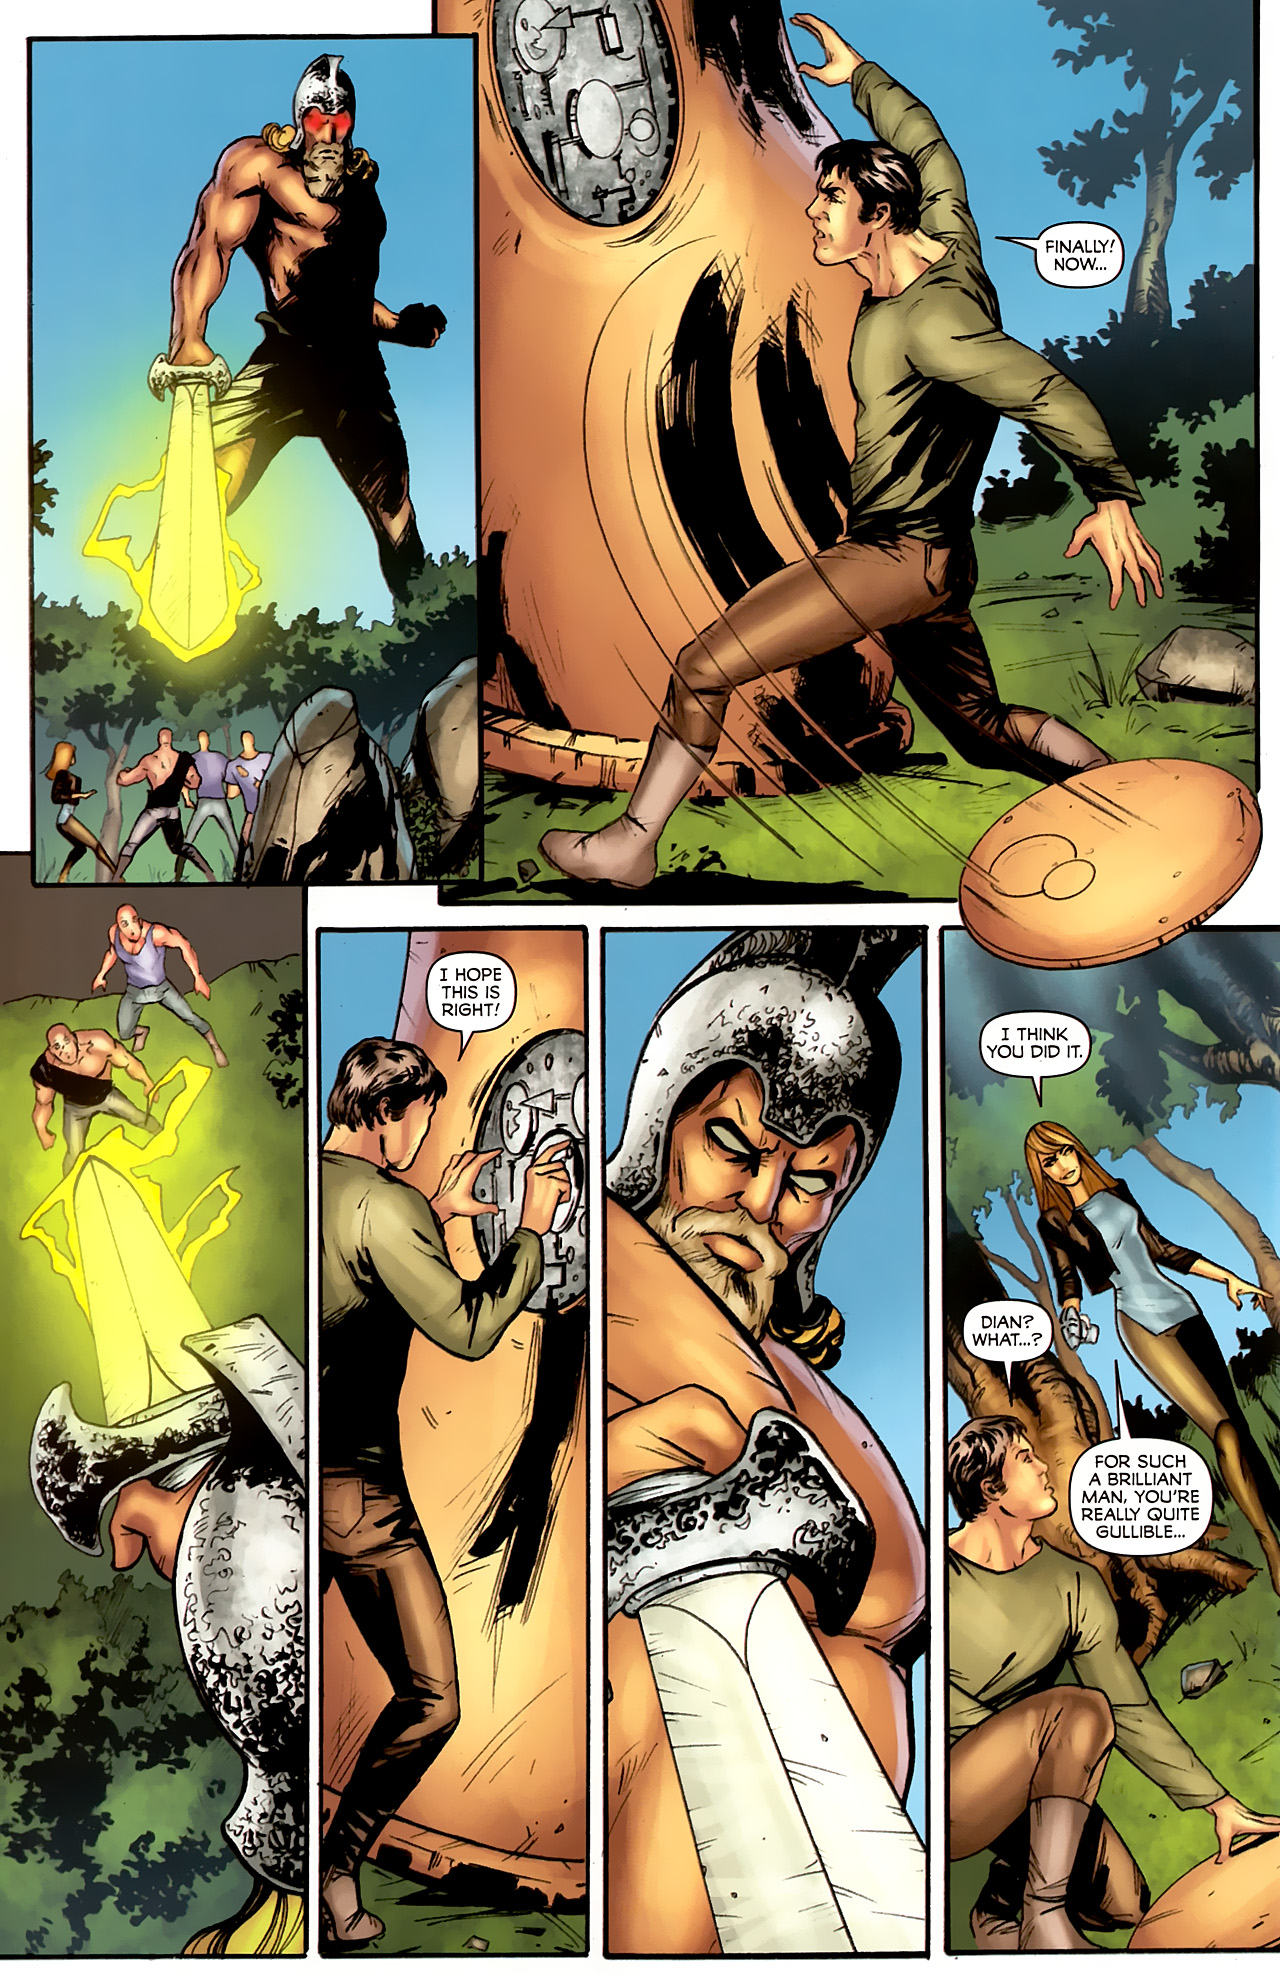 Read online Stargate: Daniel Jackson comic -  Issue #4 - 22